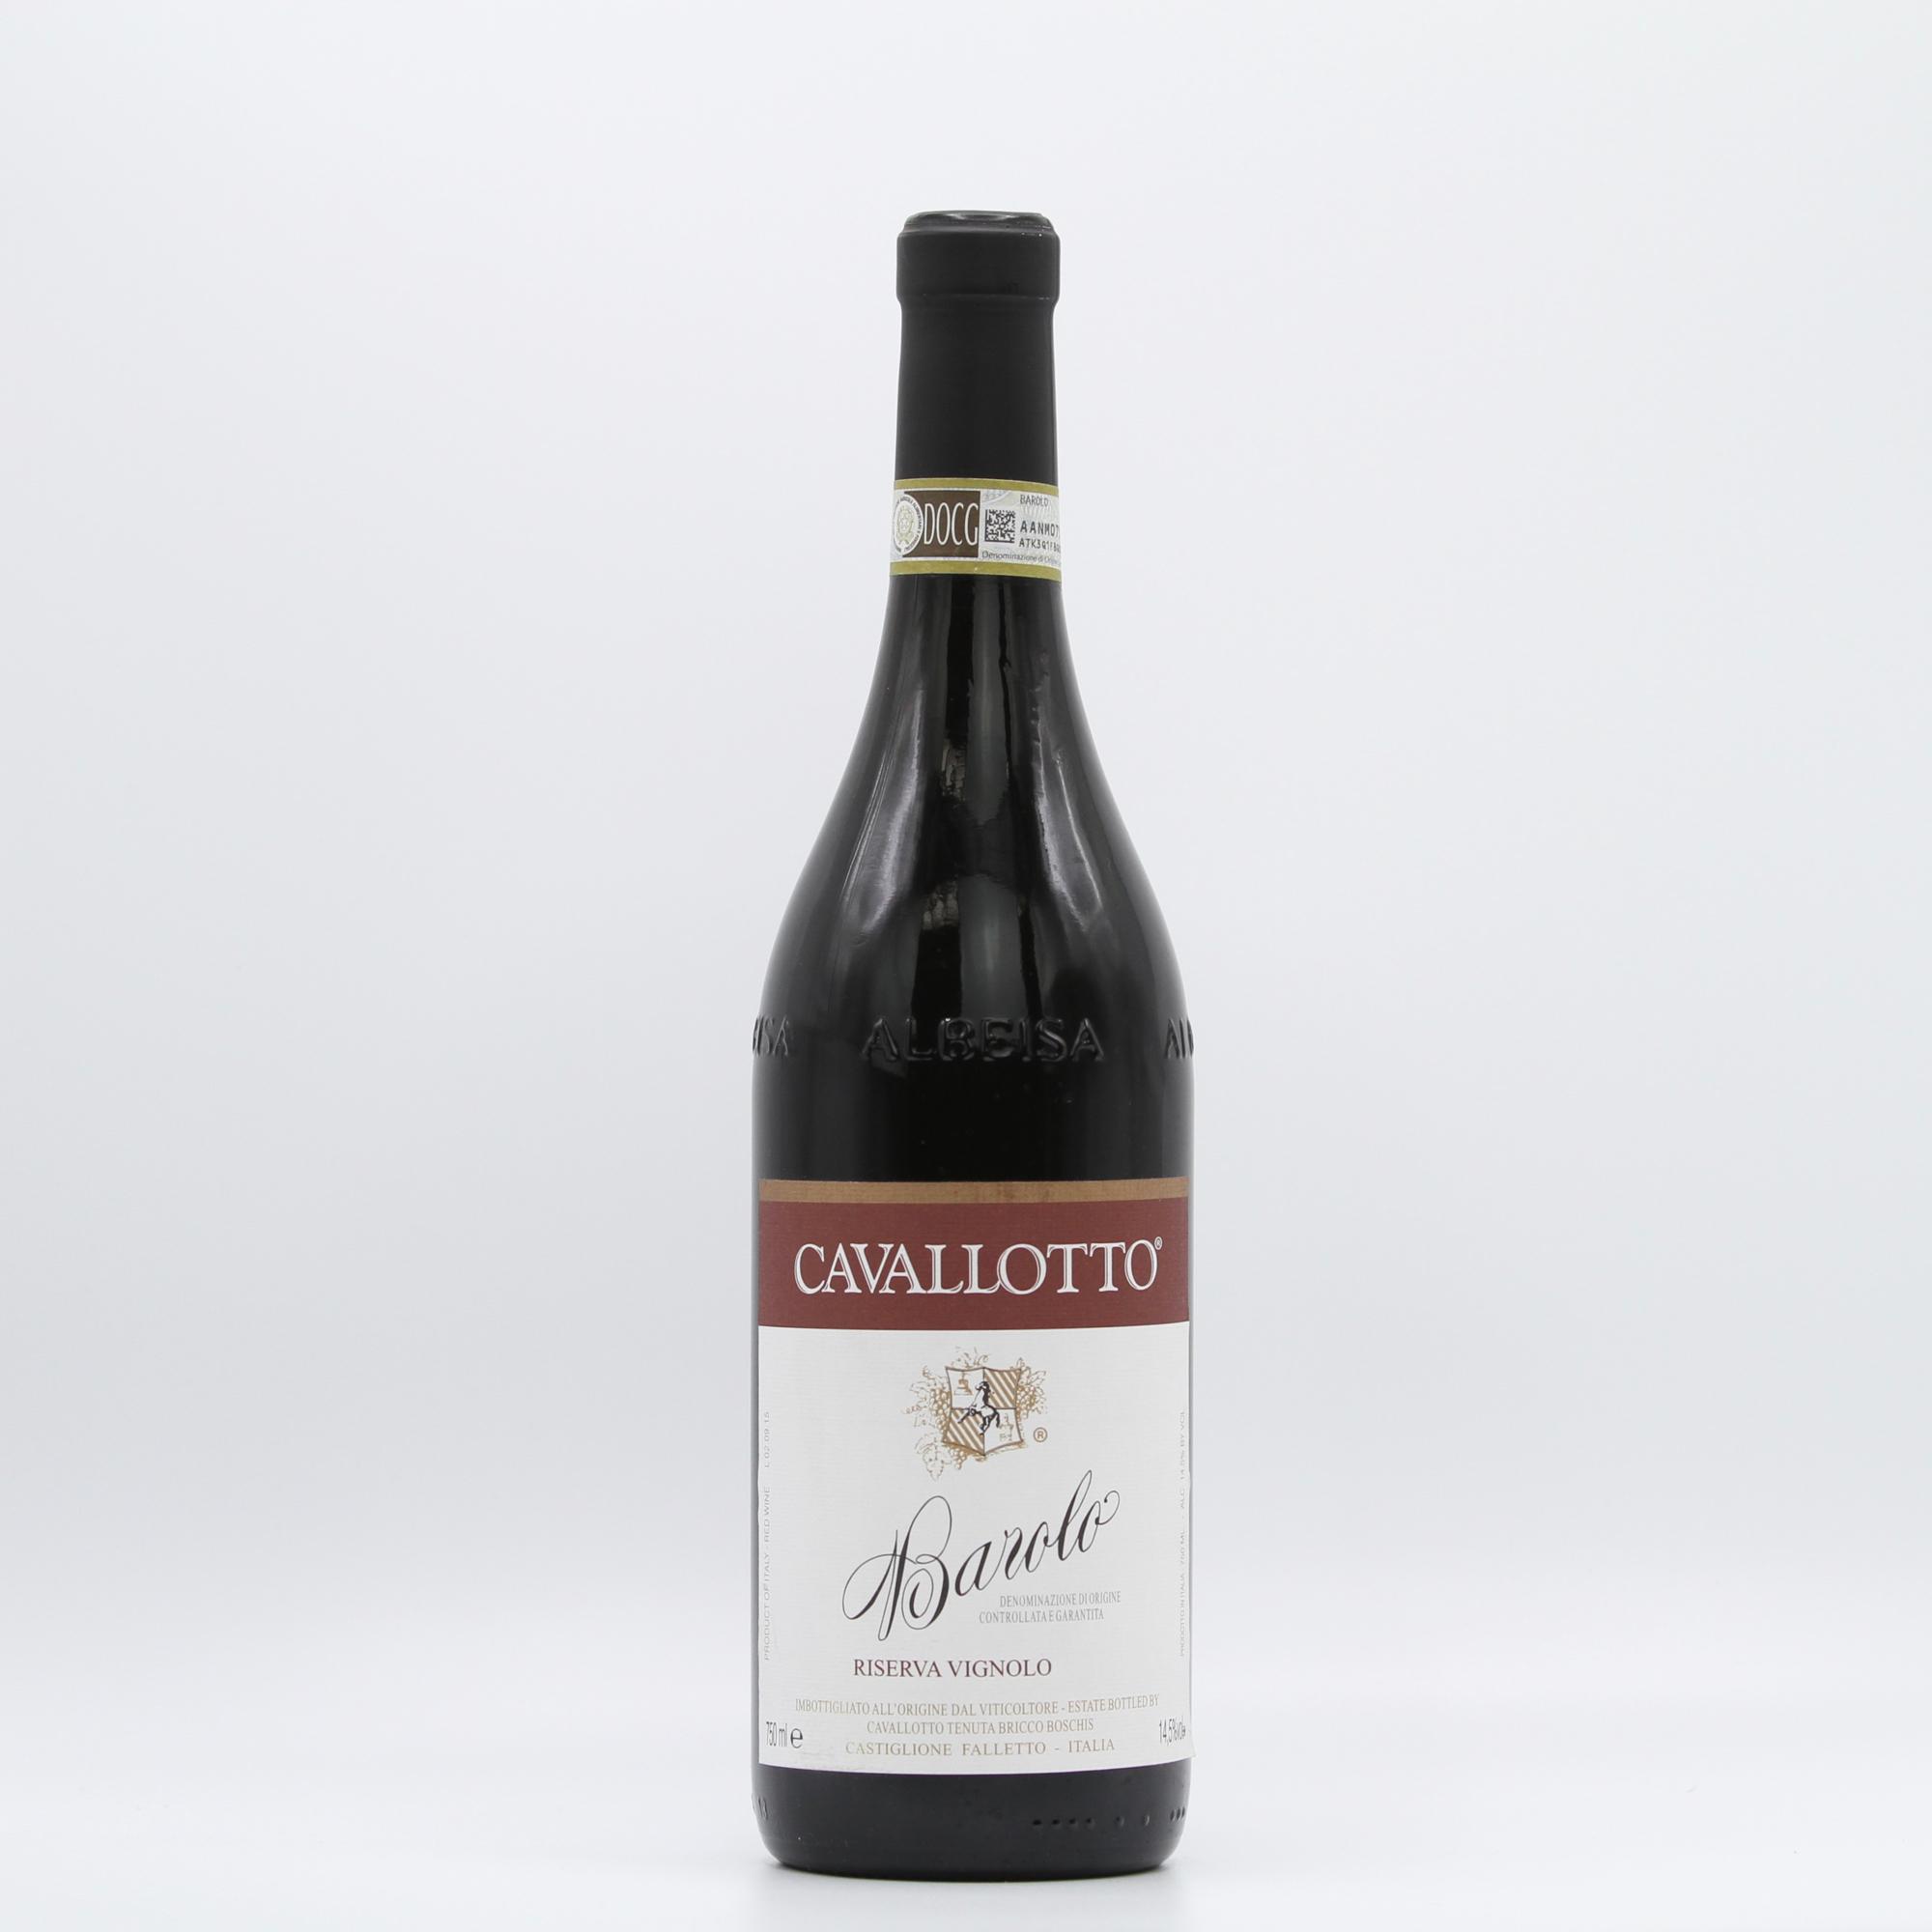 Cavalotto Barolo Ris. Vignolo.jpg